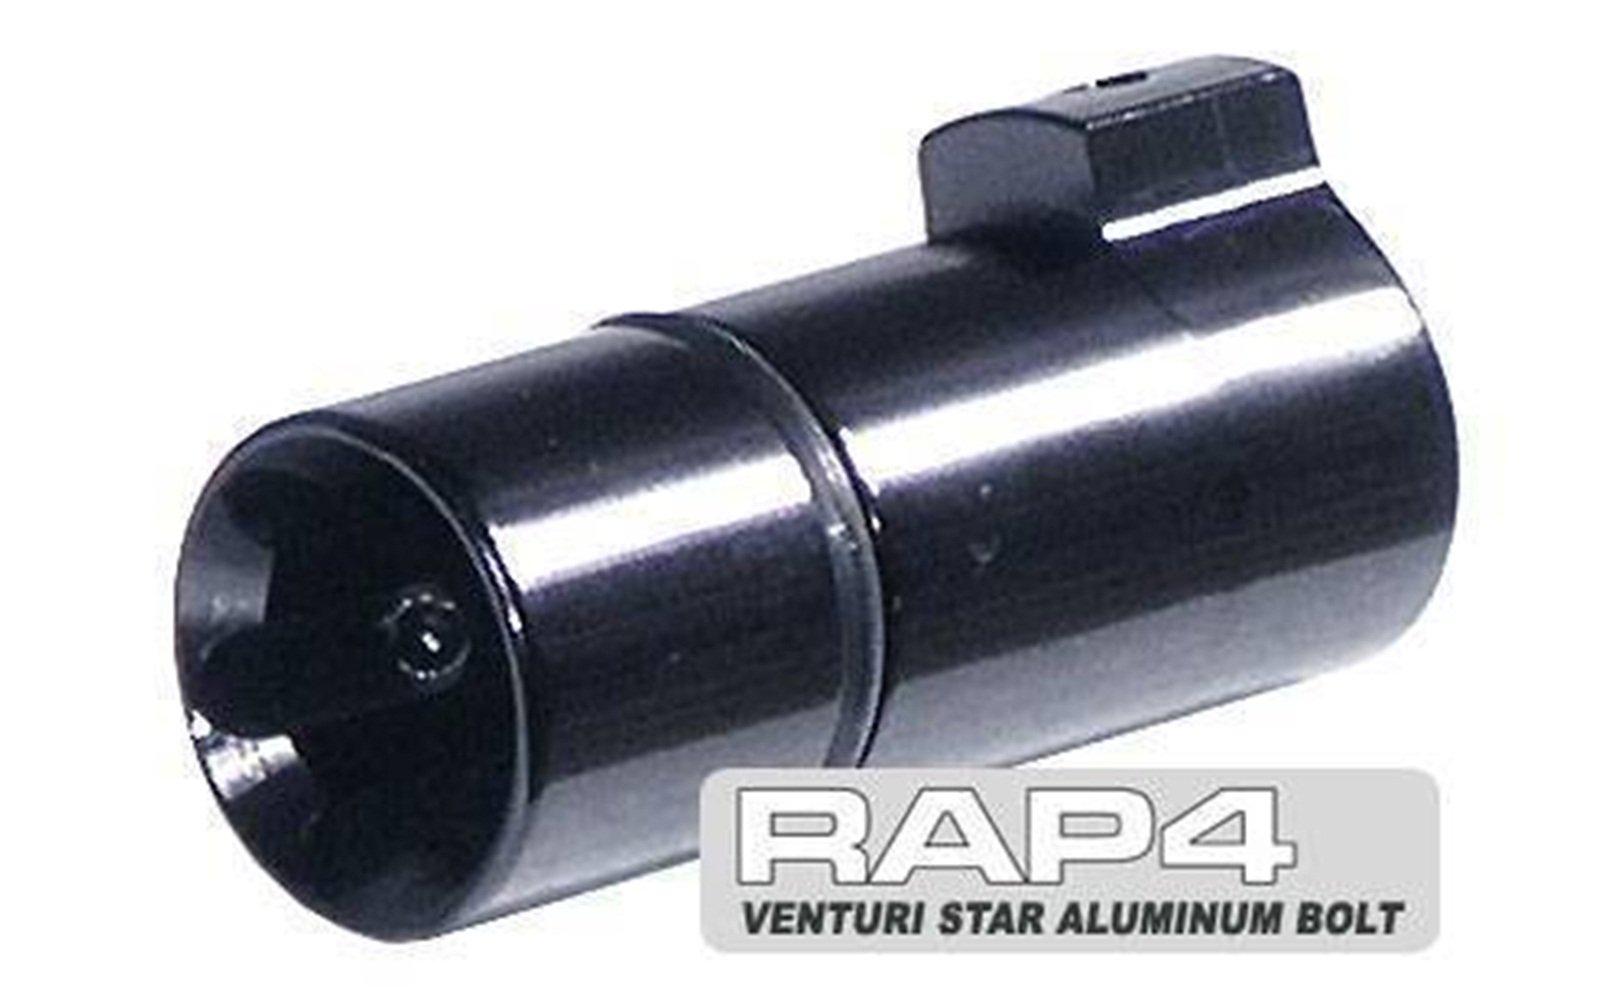 RAP4 Aluminum Venturi Star Bolt Upgrade Accessories for Tippmann A5 X7 M98 Alpha Black by Loader